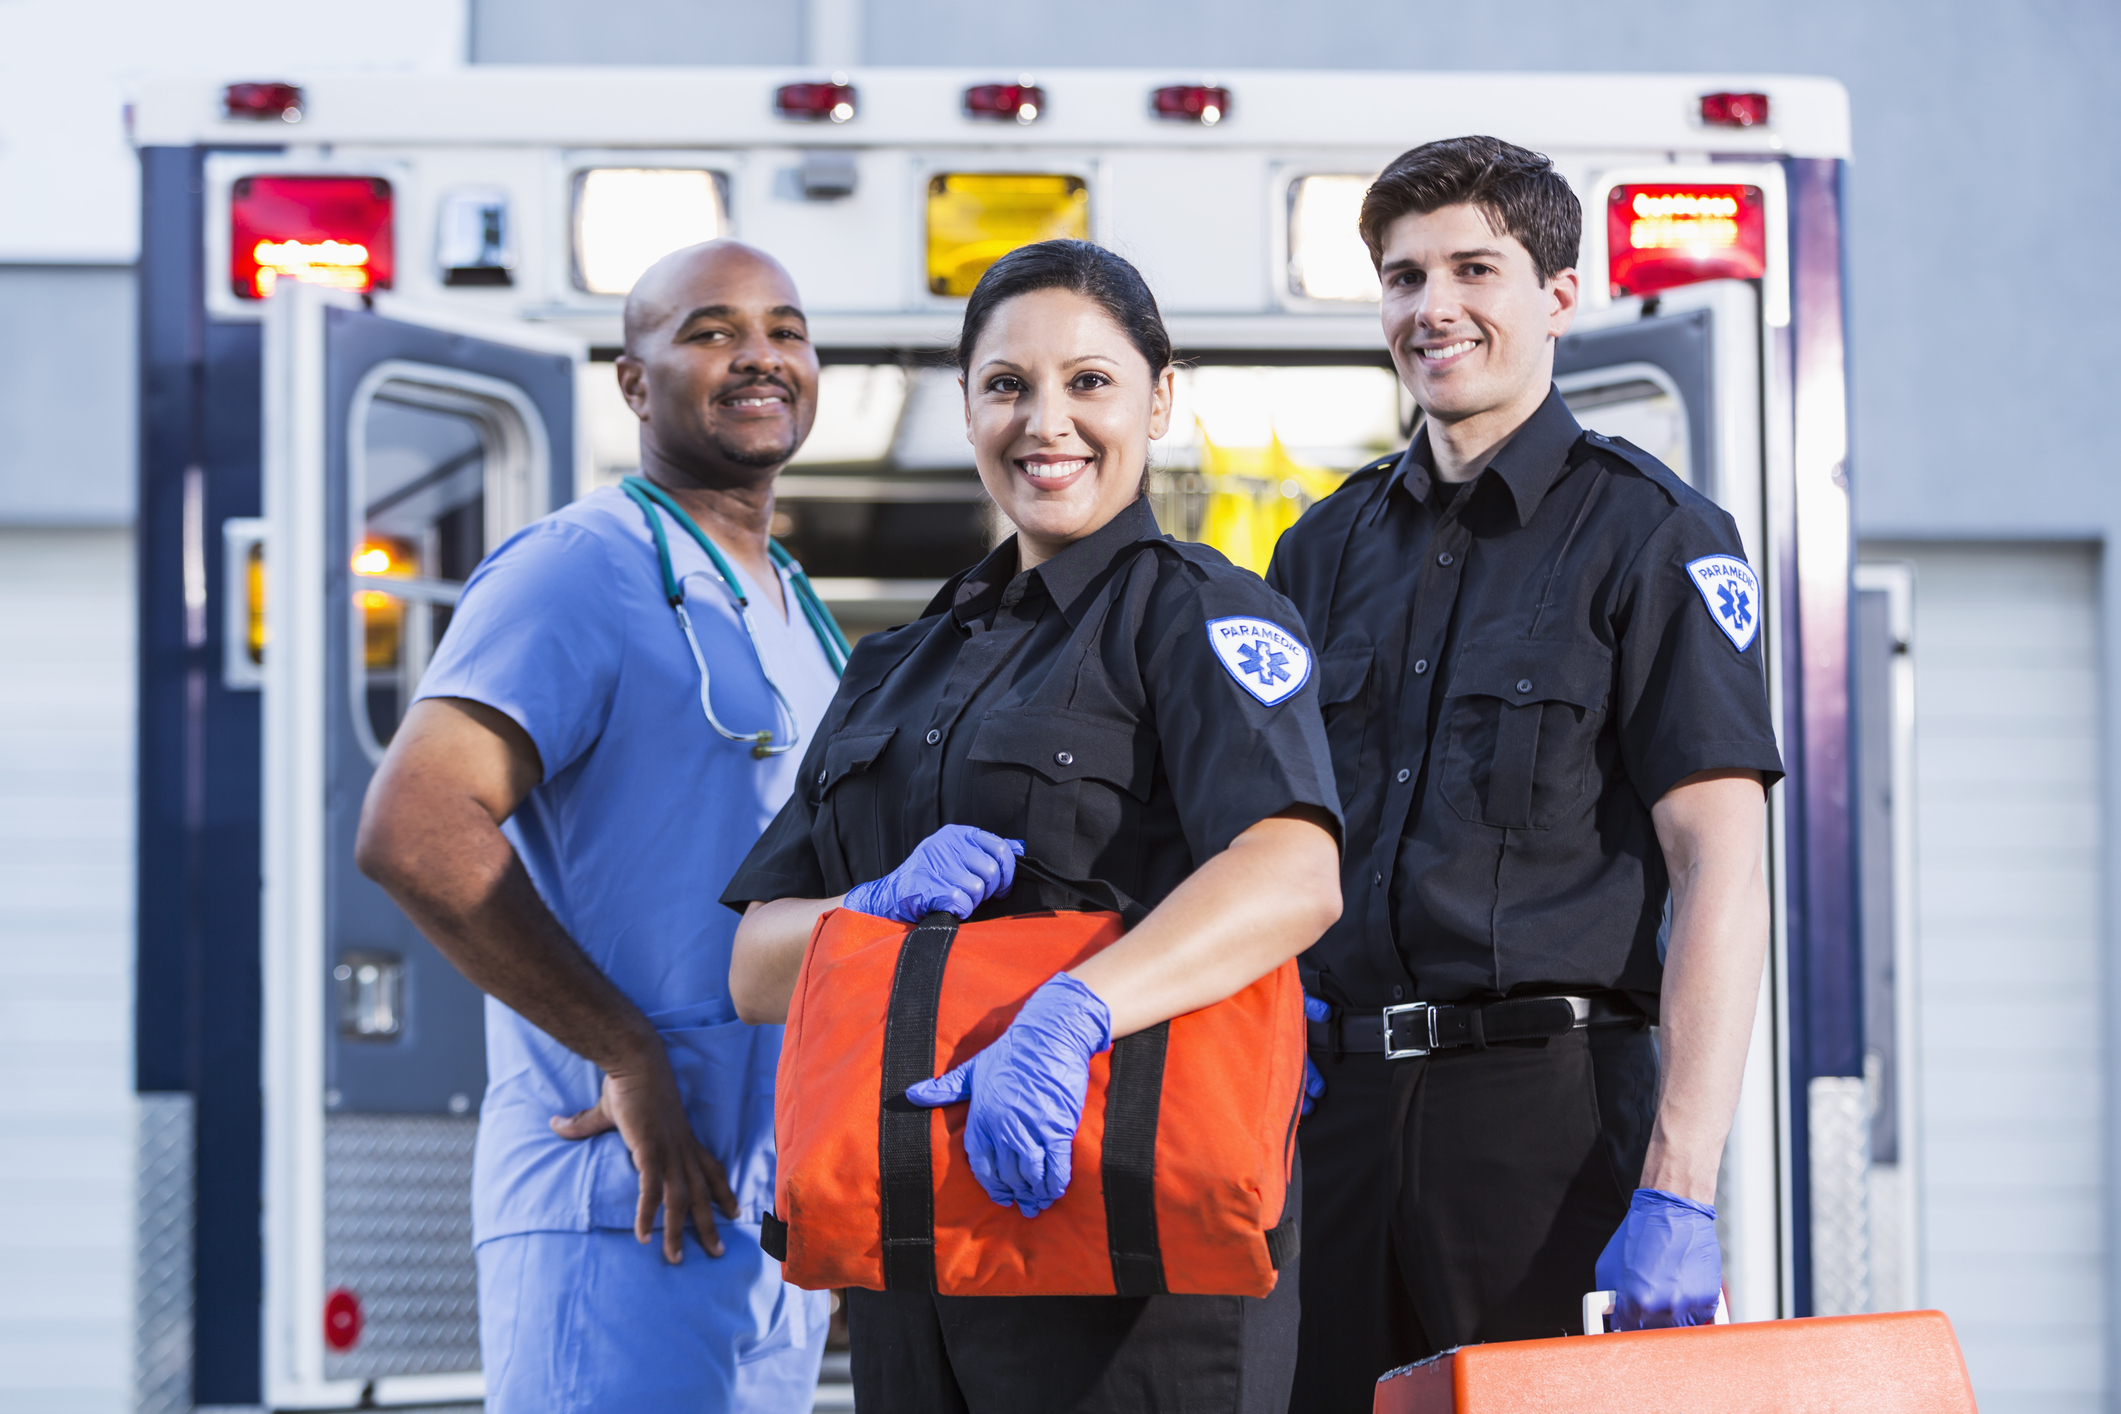 Paramedics and doctor standing at rear of ambulance.  Focus on paramedics (30s, Hispanic).